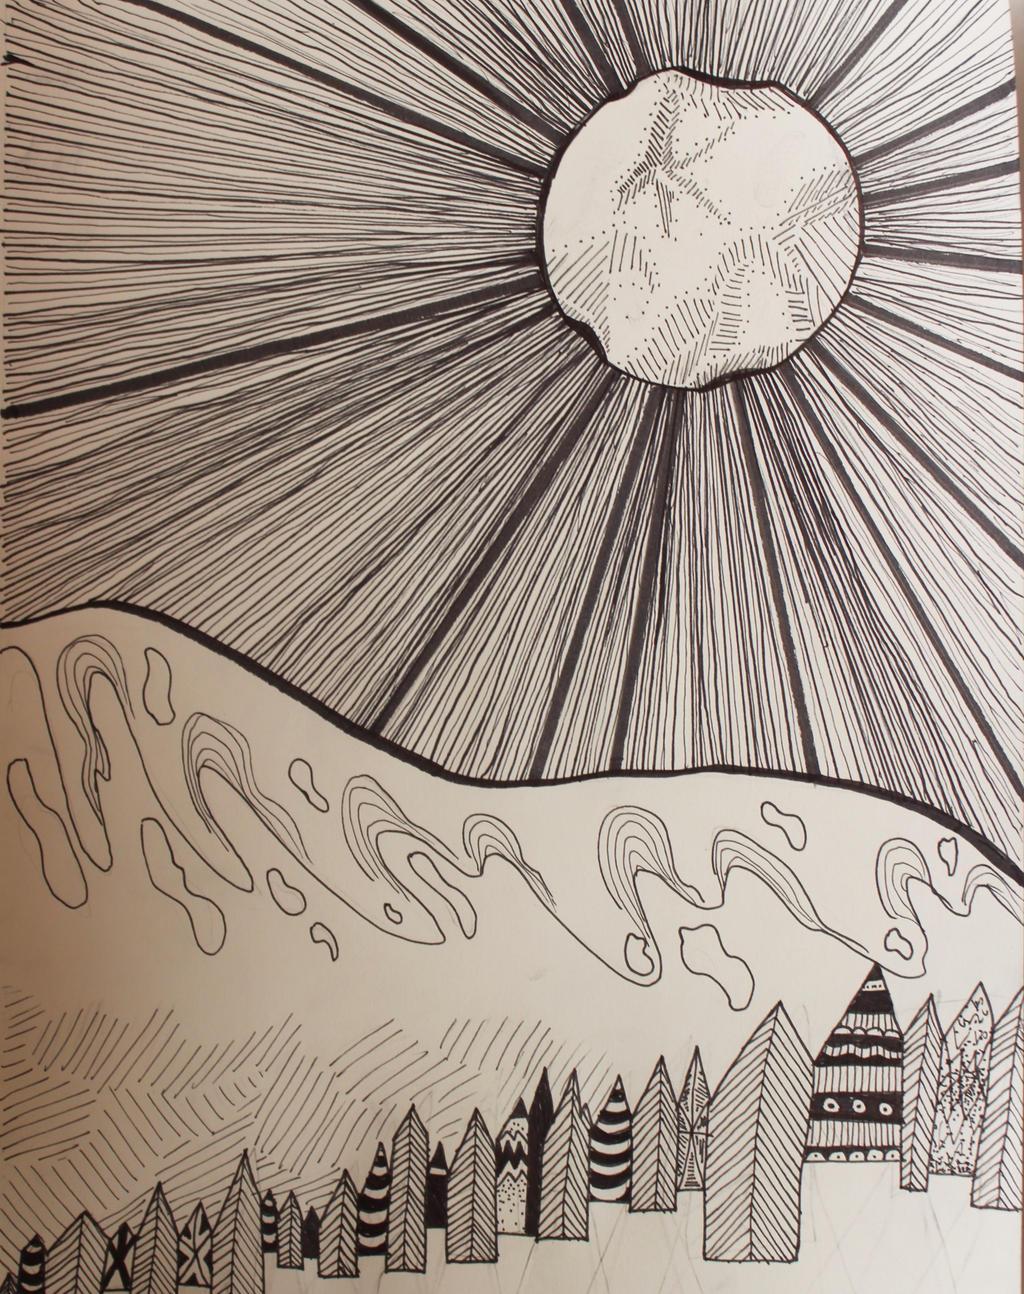 Moon Beam by wingedmusician